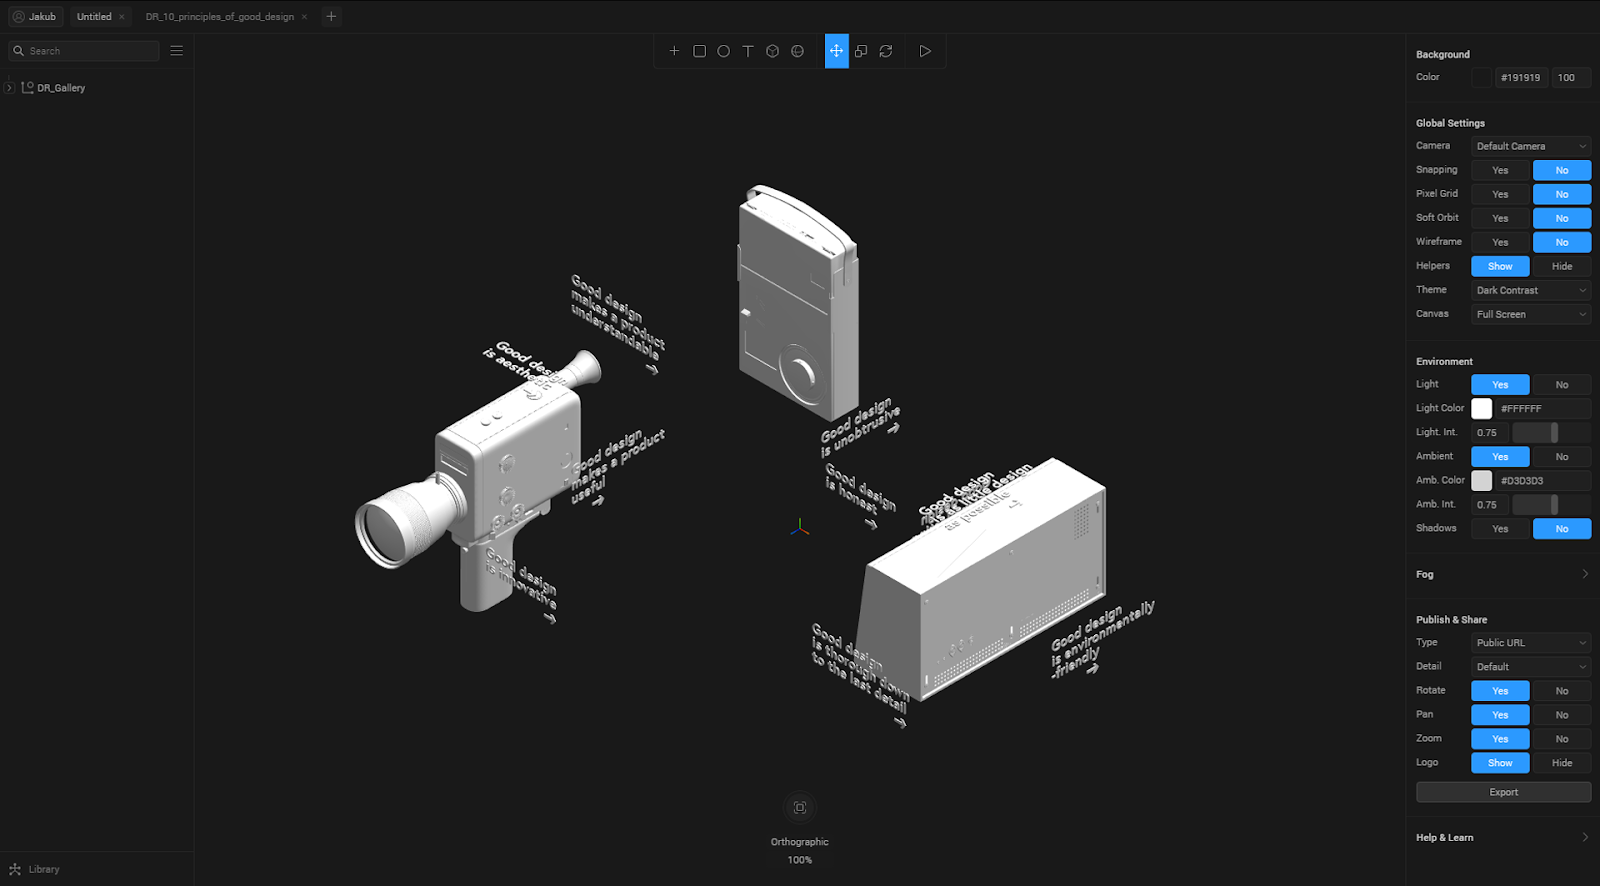 Spline interaction tutorial - ortographic camera view